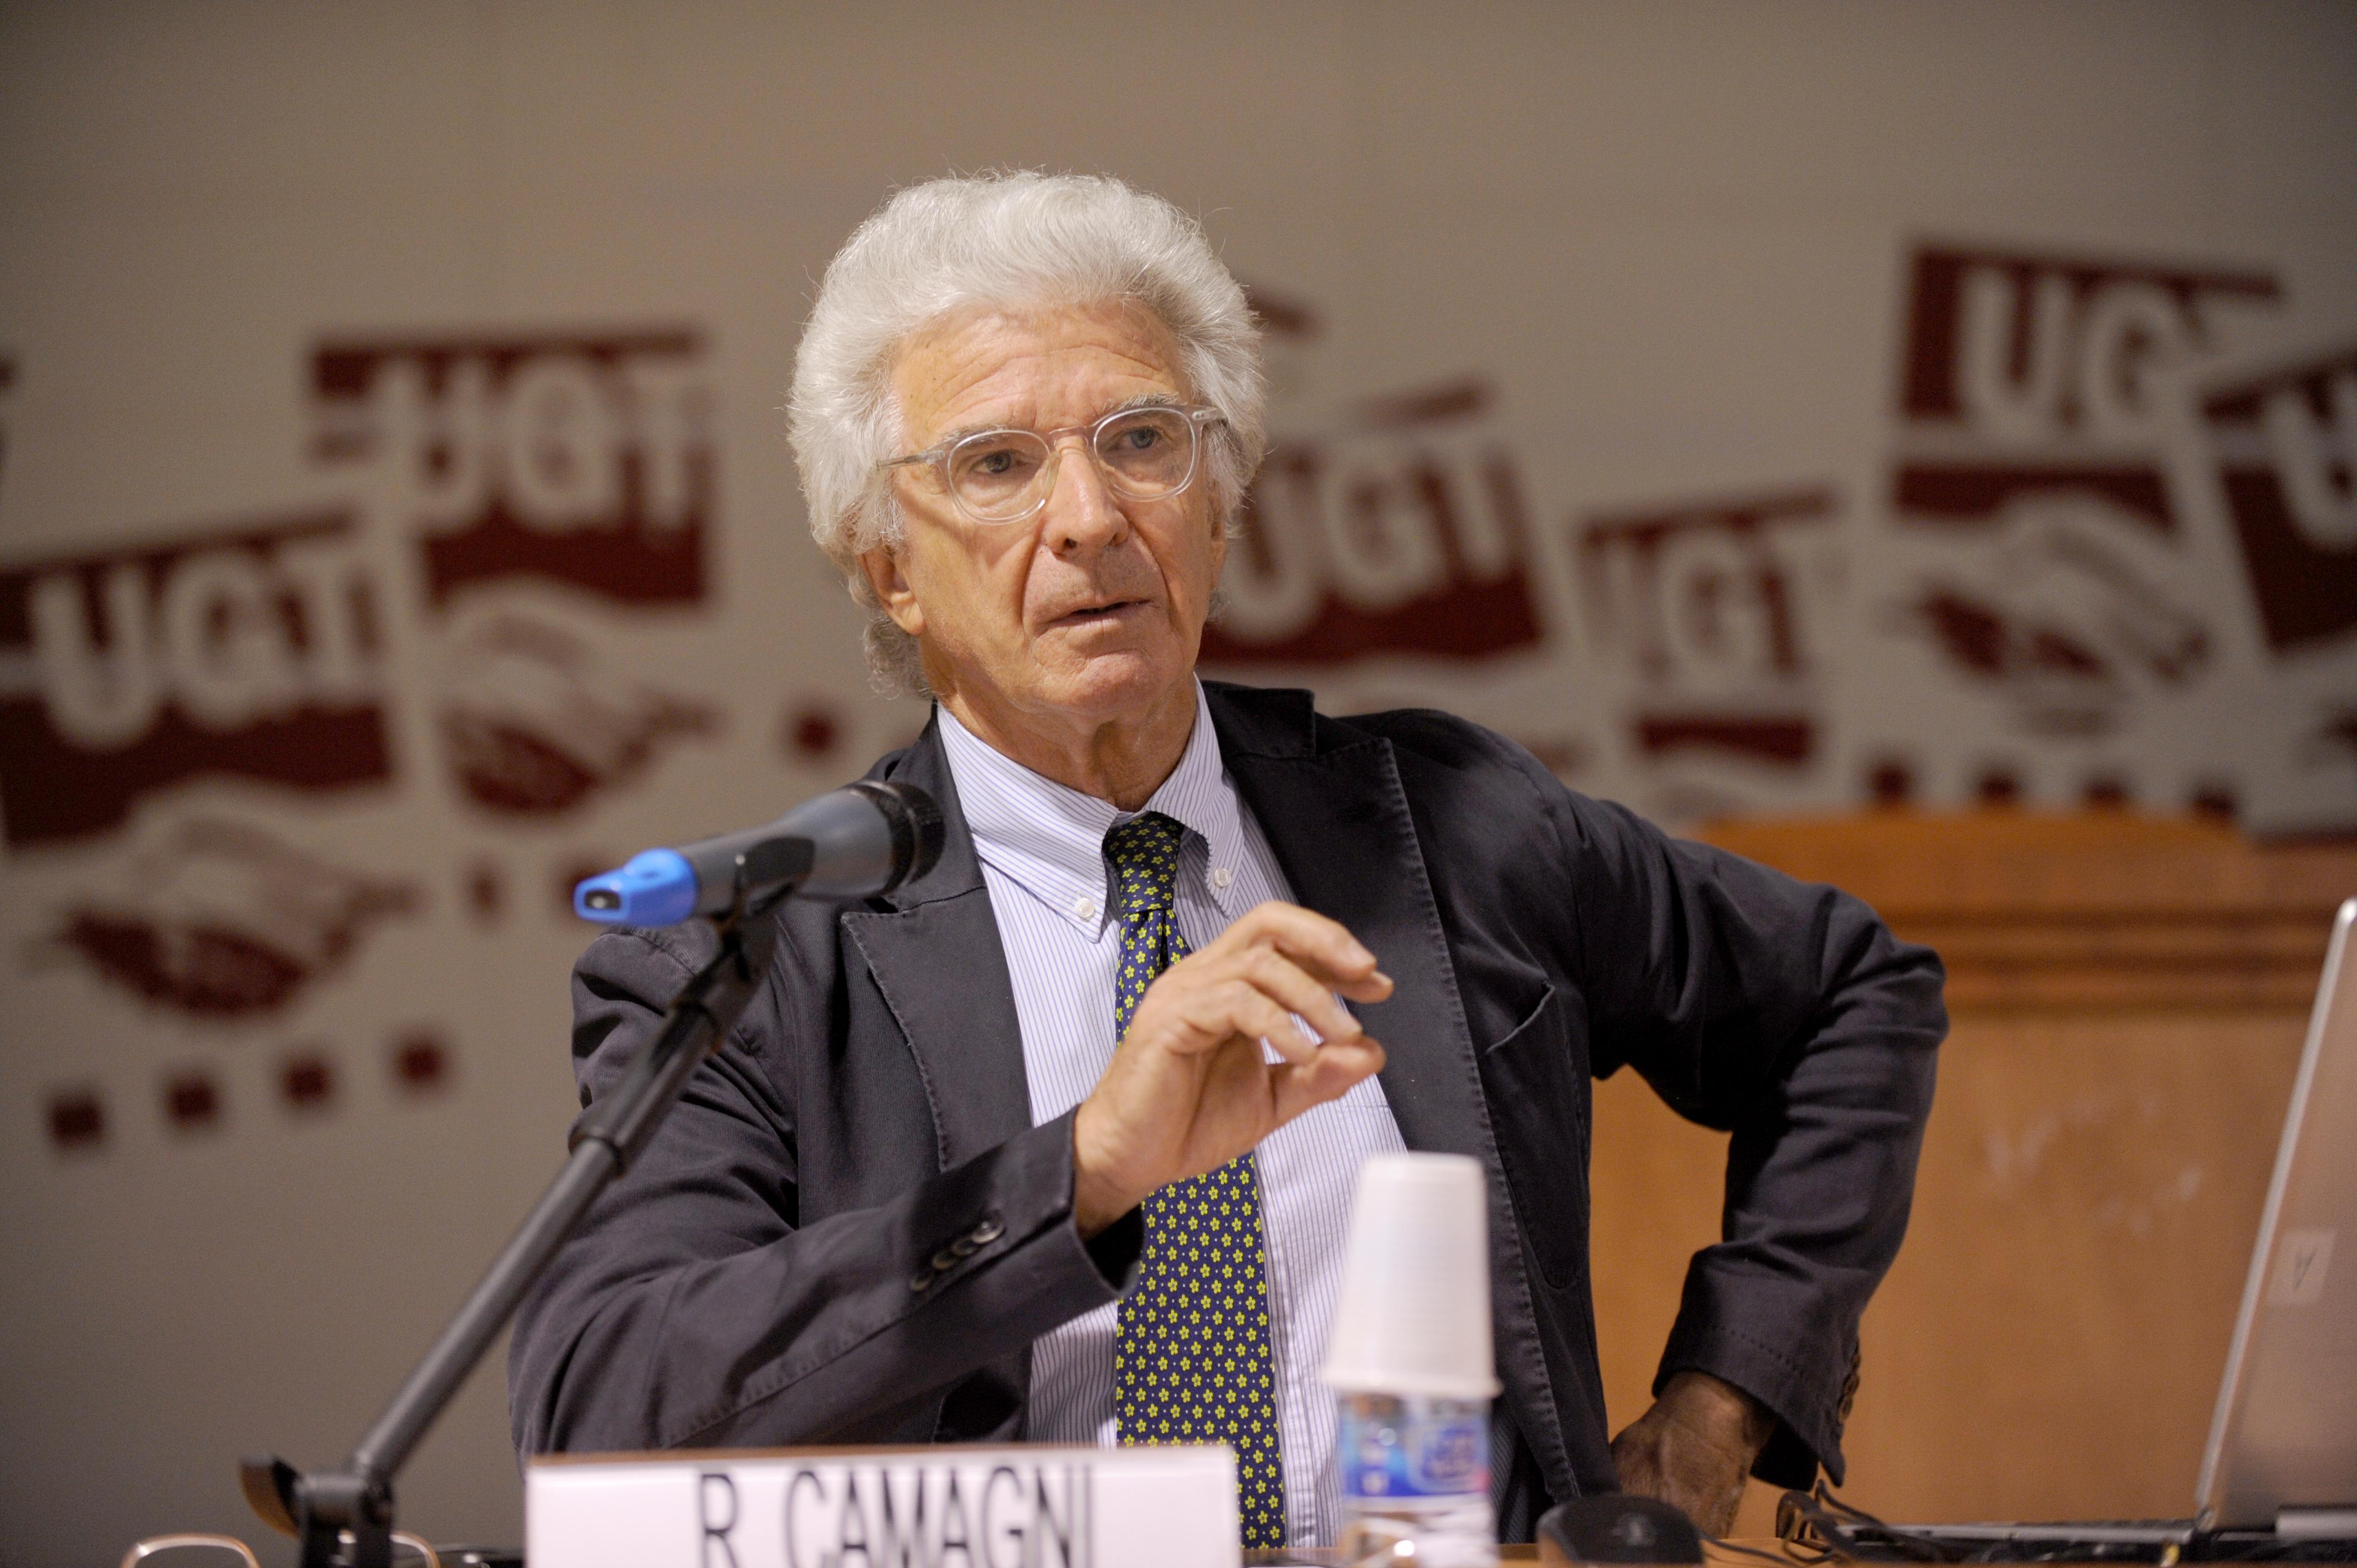 Roberto Camagni